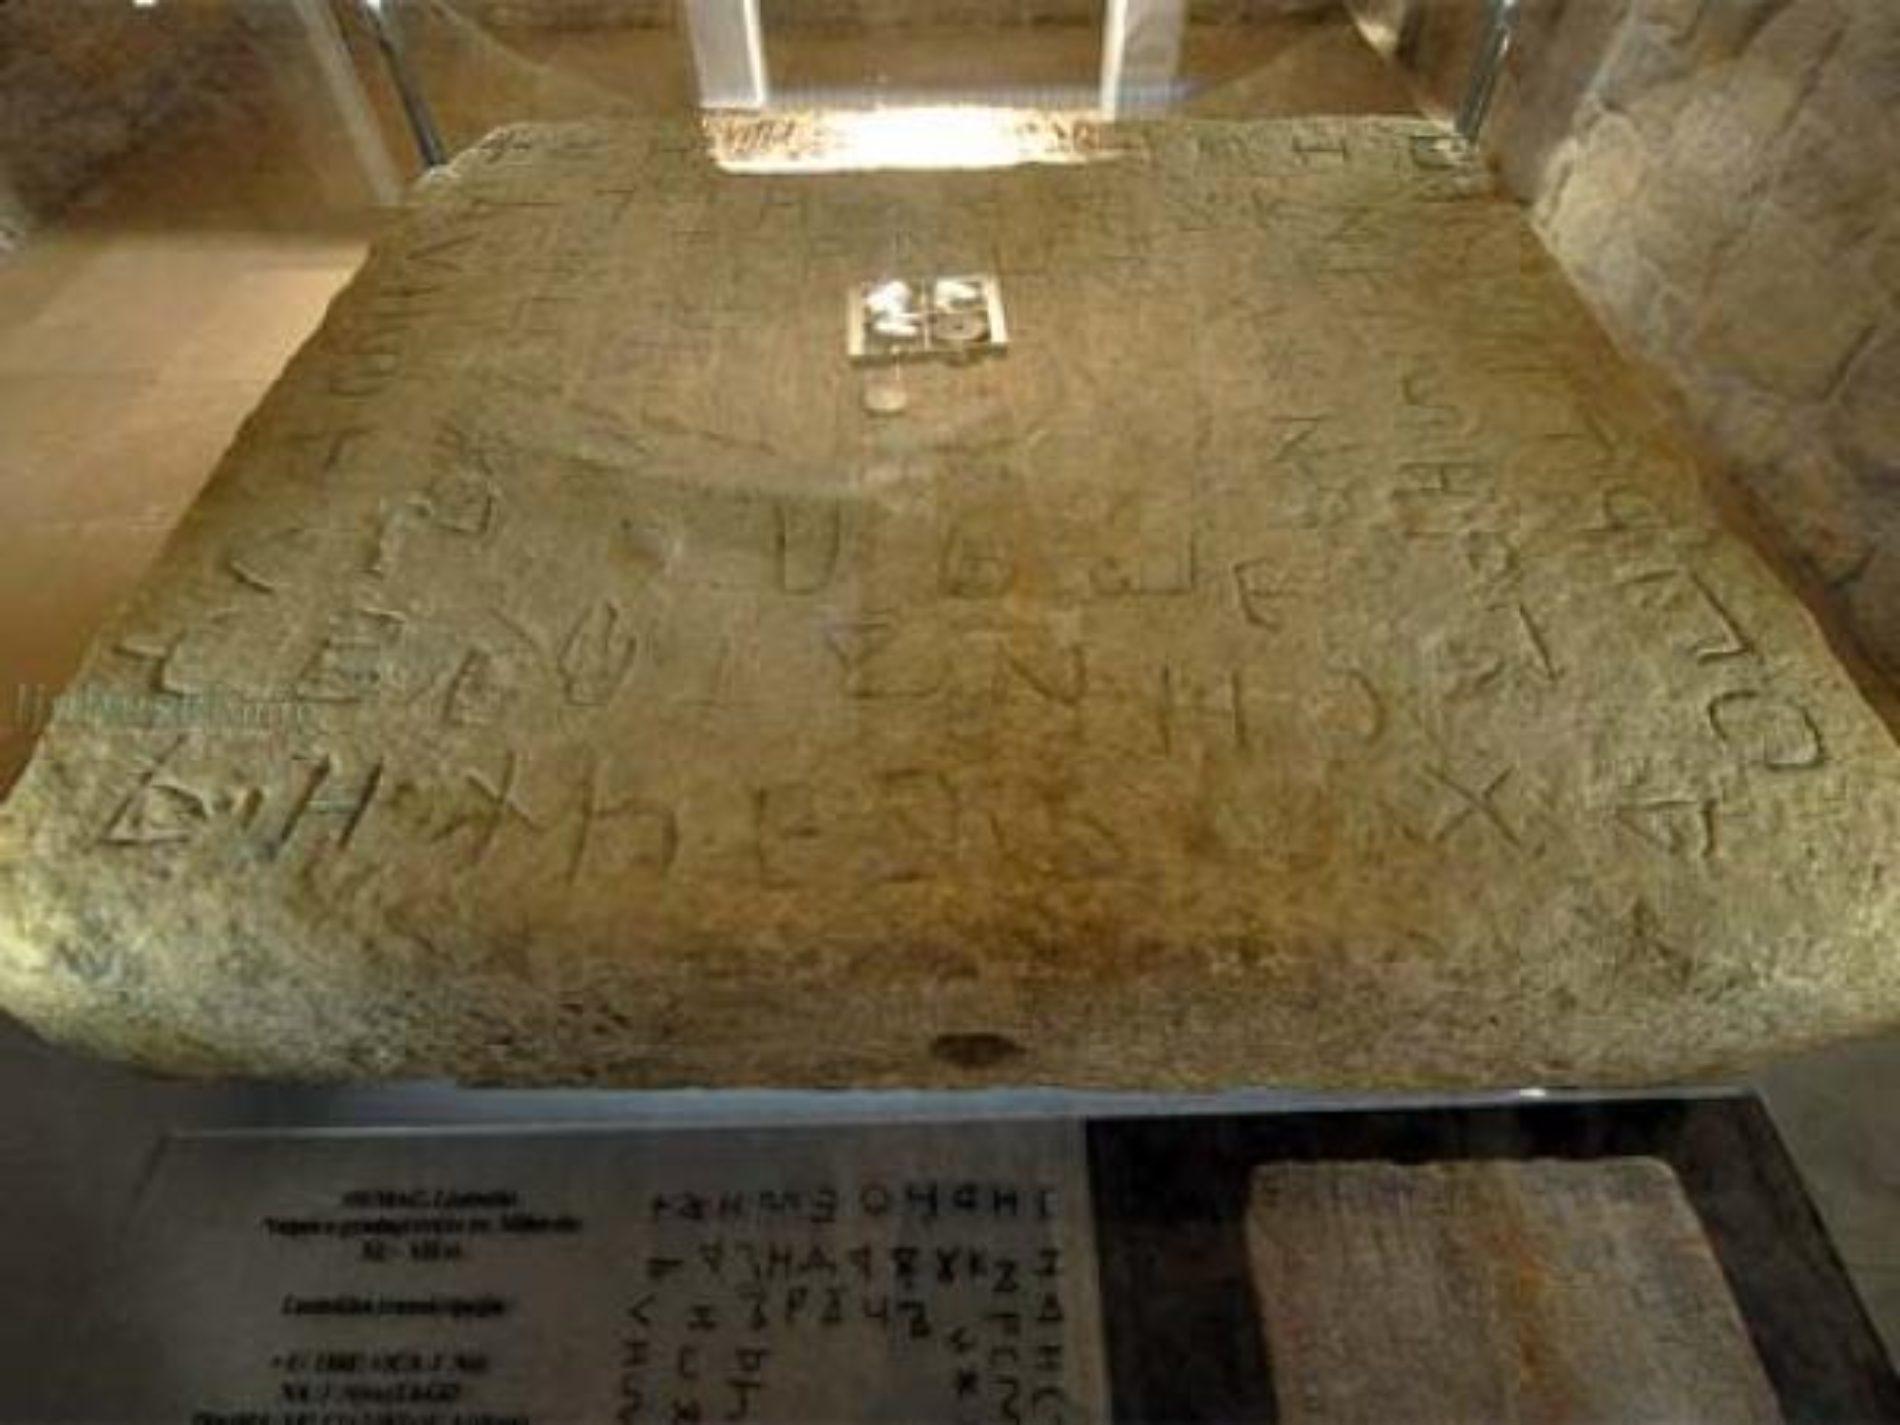 KNJIGA: Jezik i grafija srednjovjekovne bosanske epigrafike